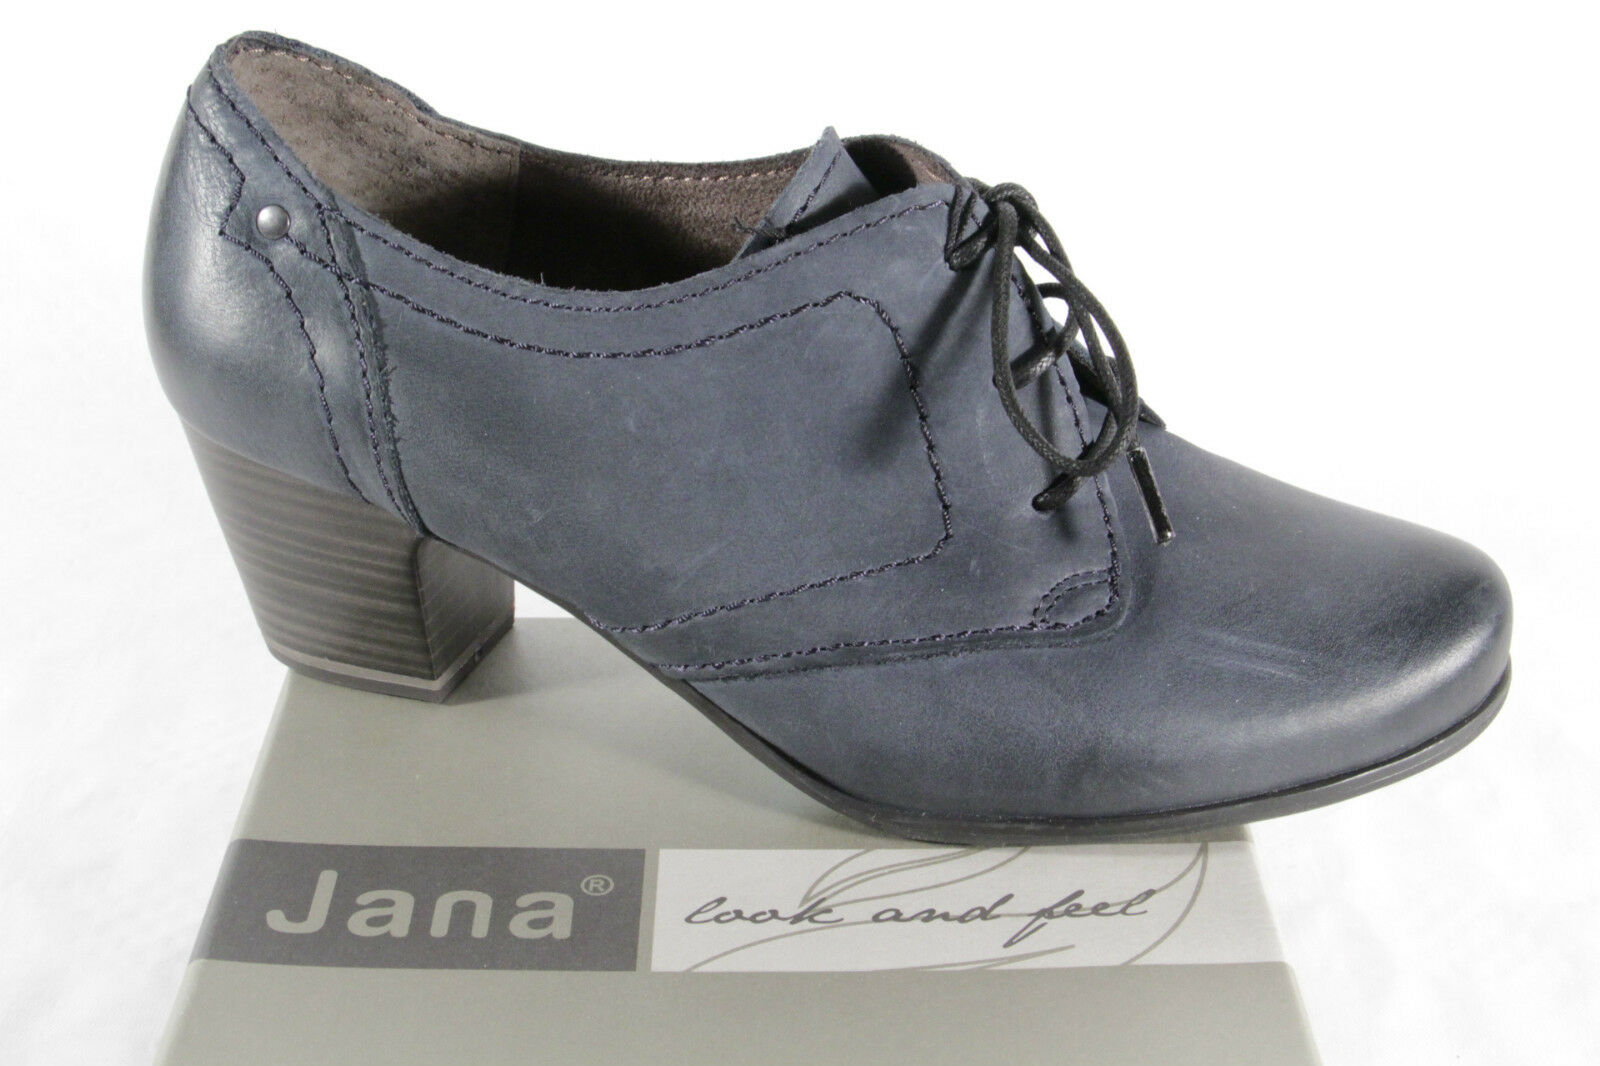 Remonte Scarpe Basse in Oversize Bianco donna r3404-80 grandi scarpe da donna Bianco c68d76